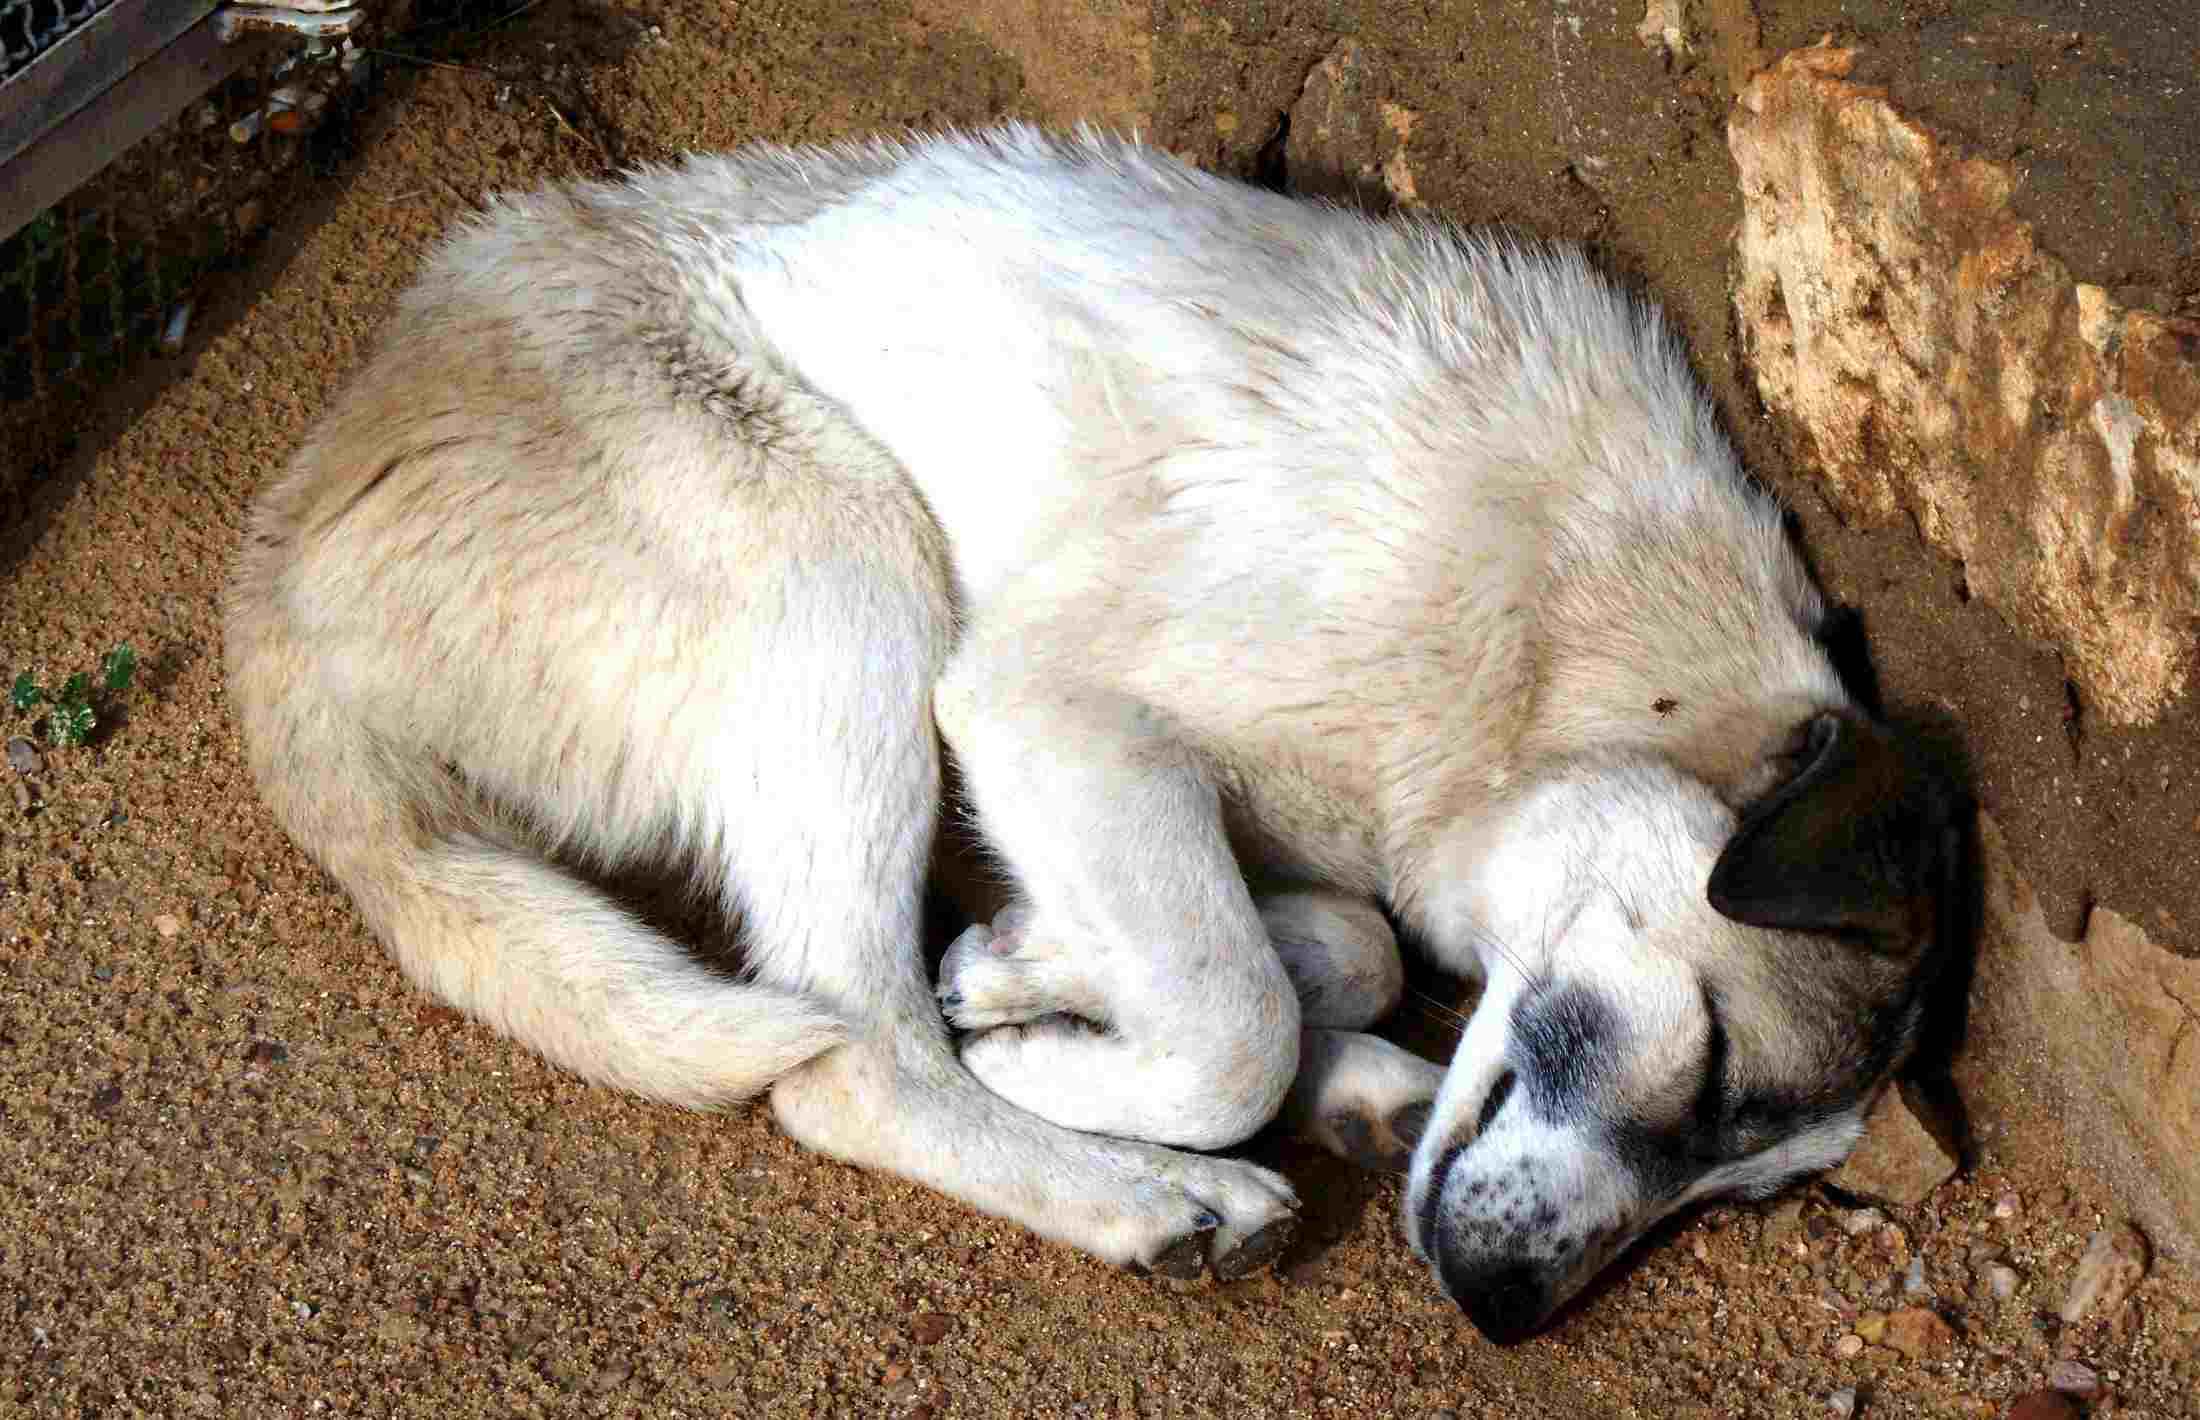 A dog sleeping on the ground